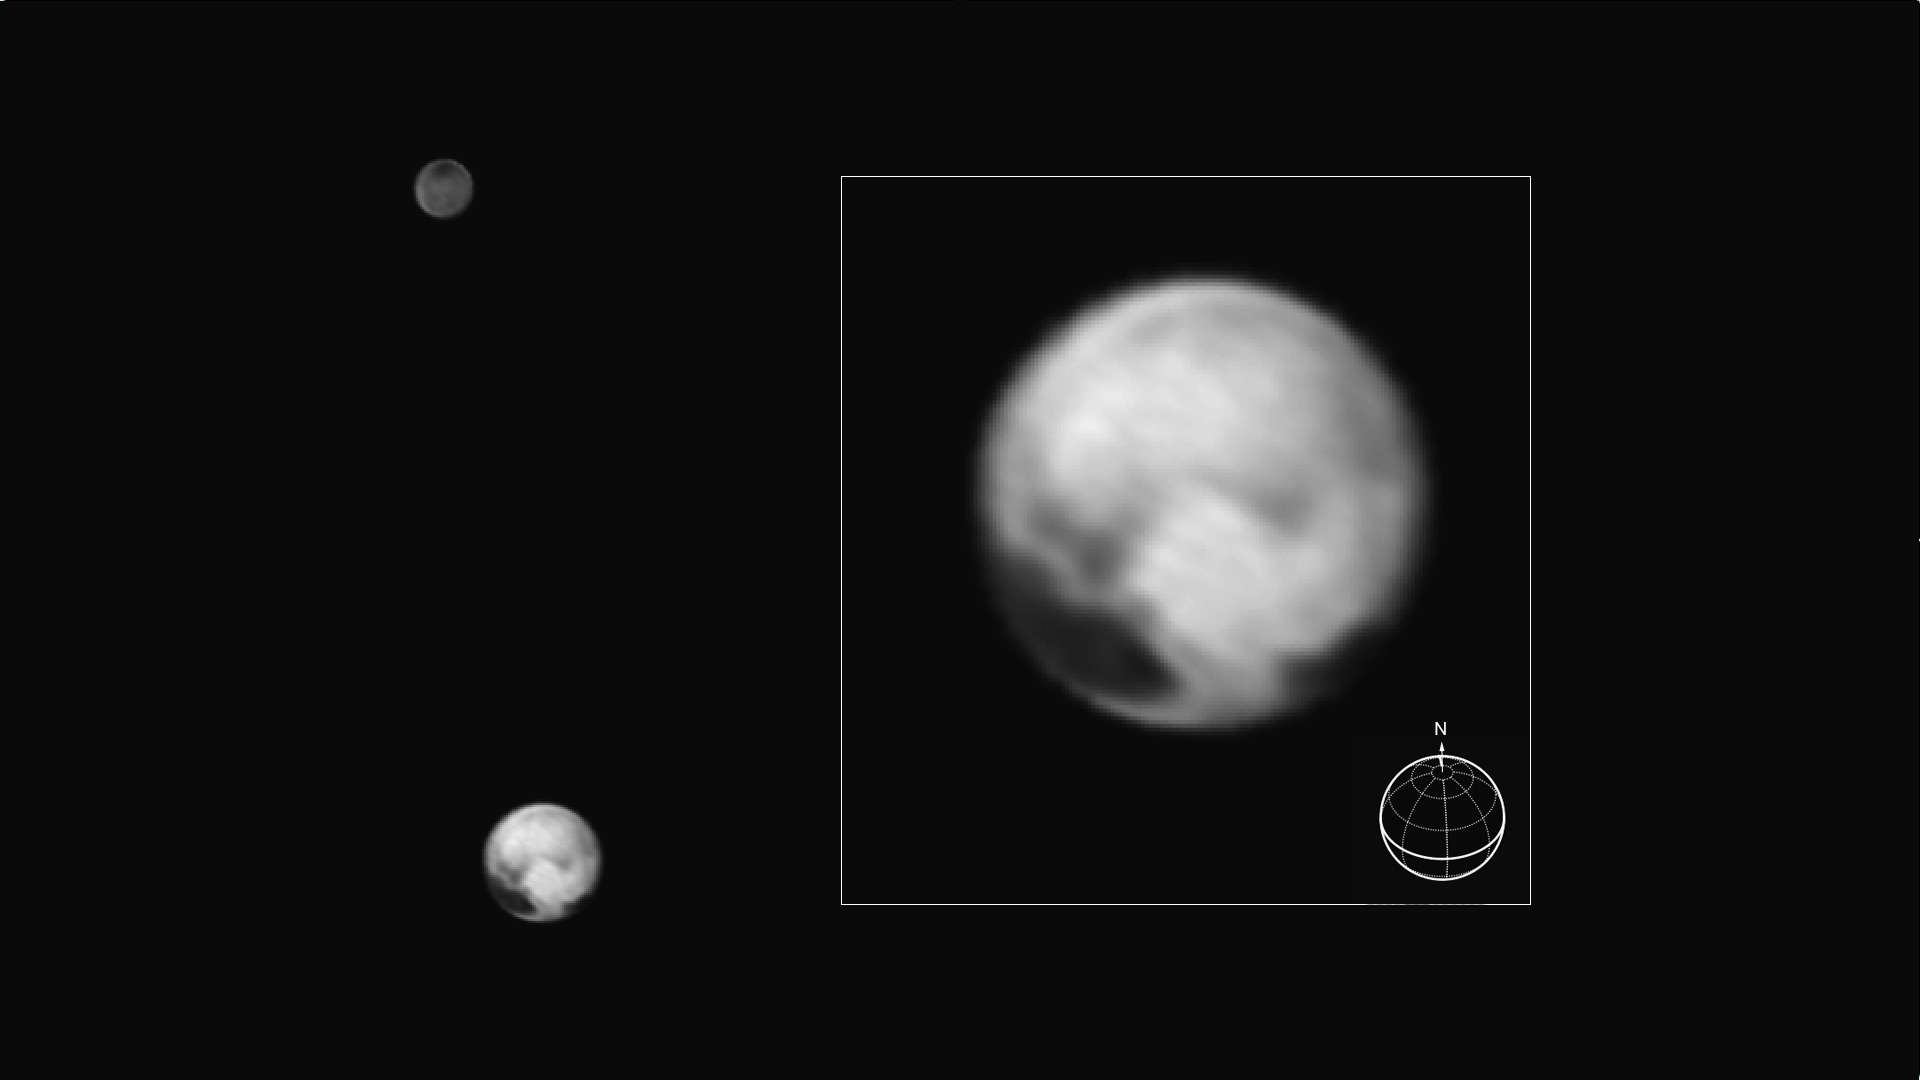 pluto spacecraft new arrival horizon - photo #28